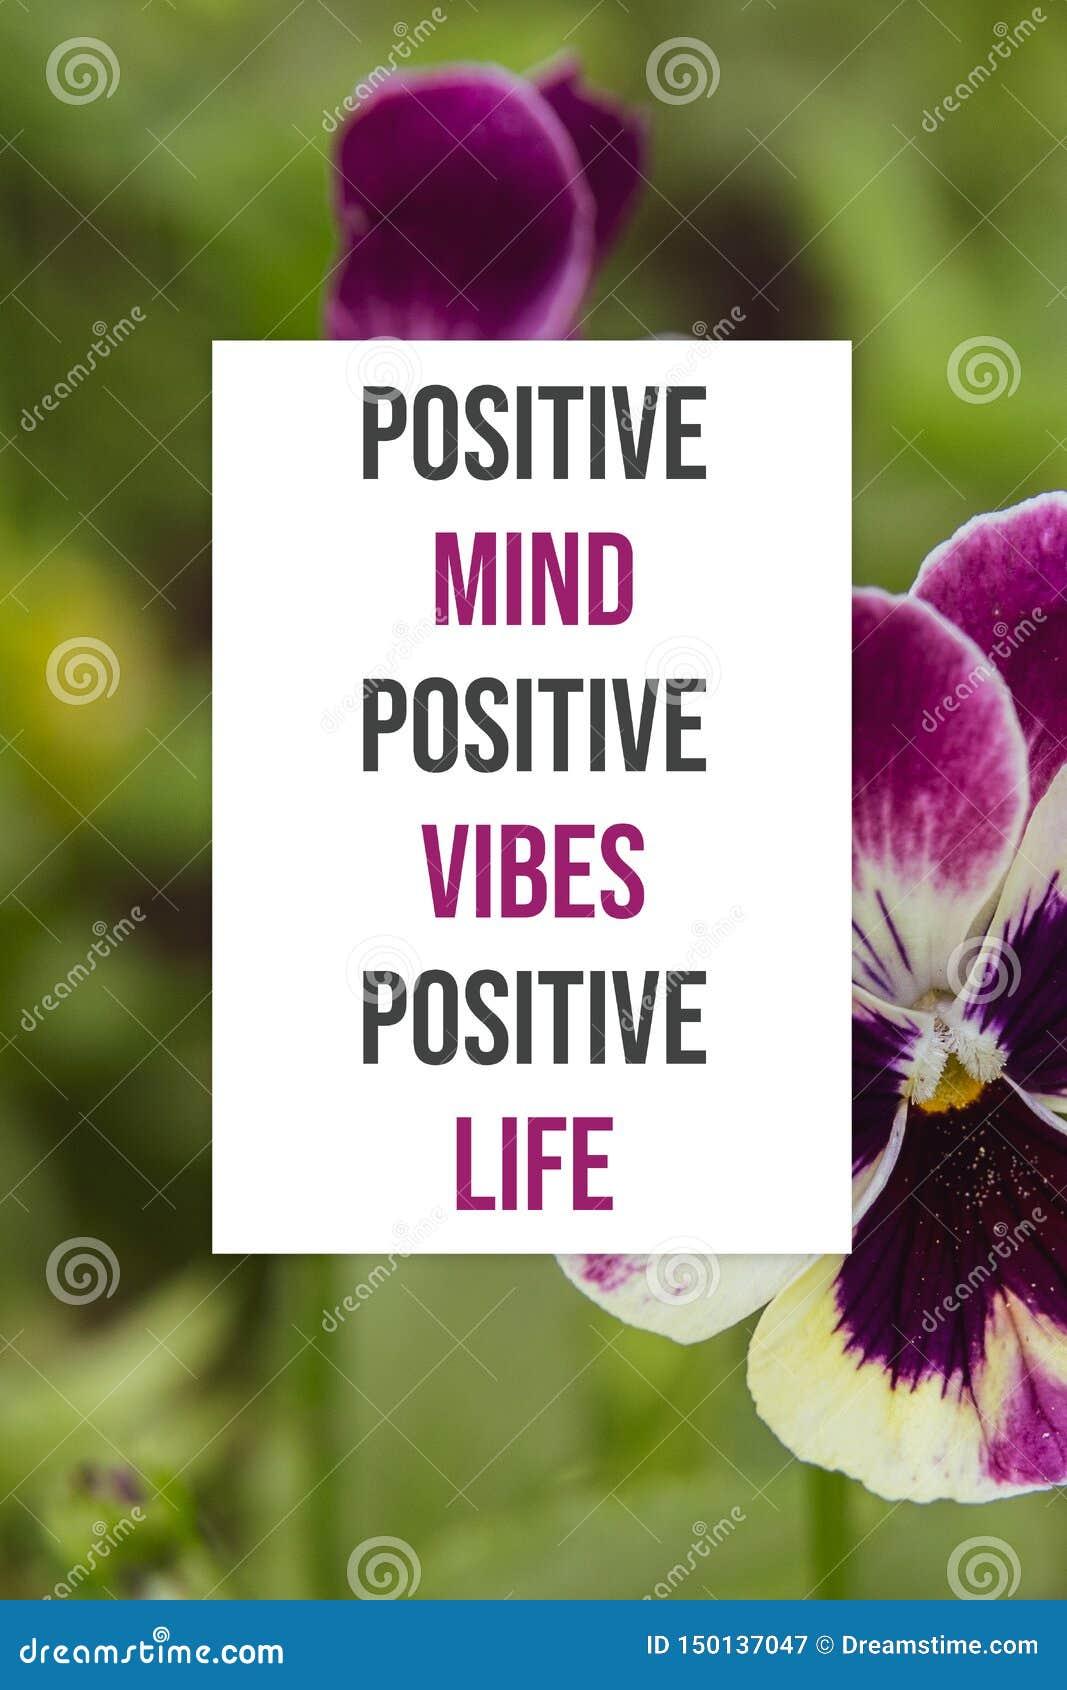 Inspirational poster Positive mind positive vibes positive life